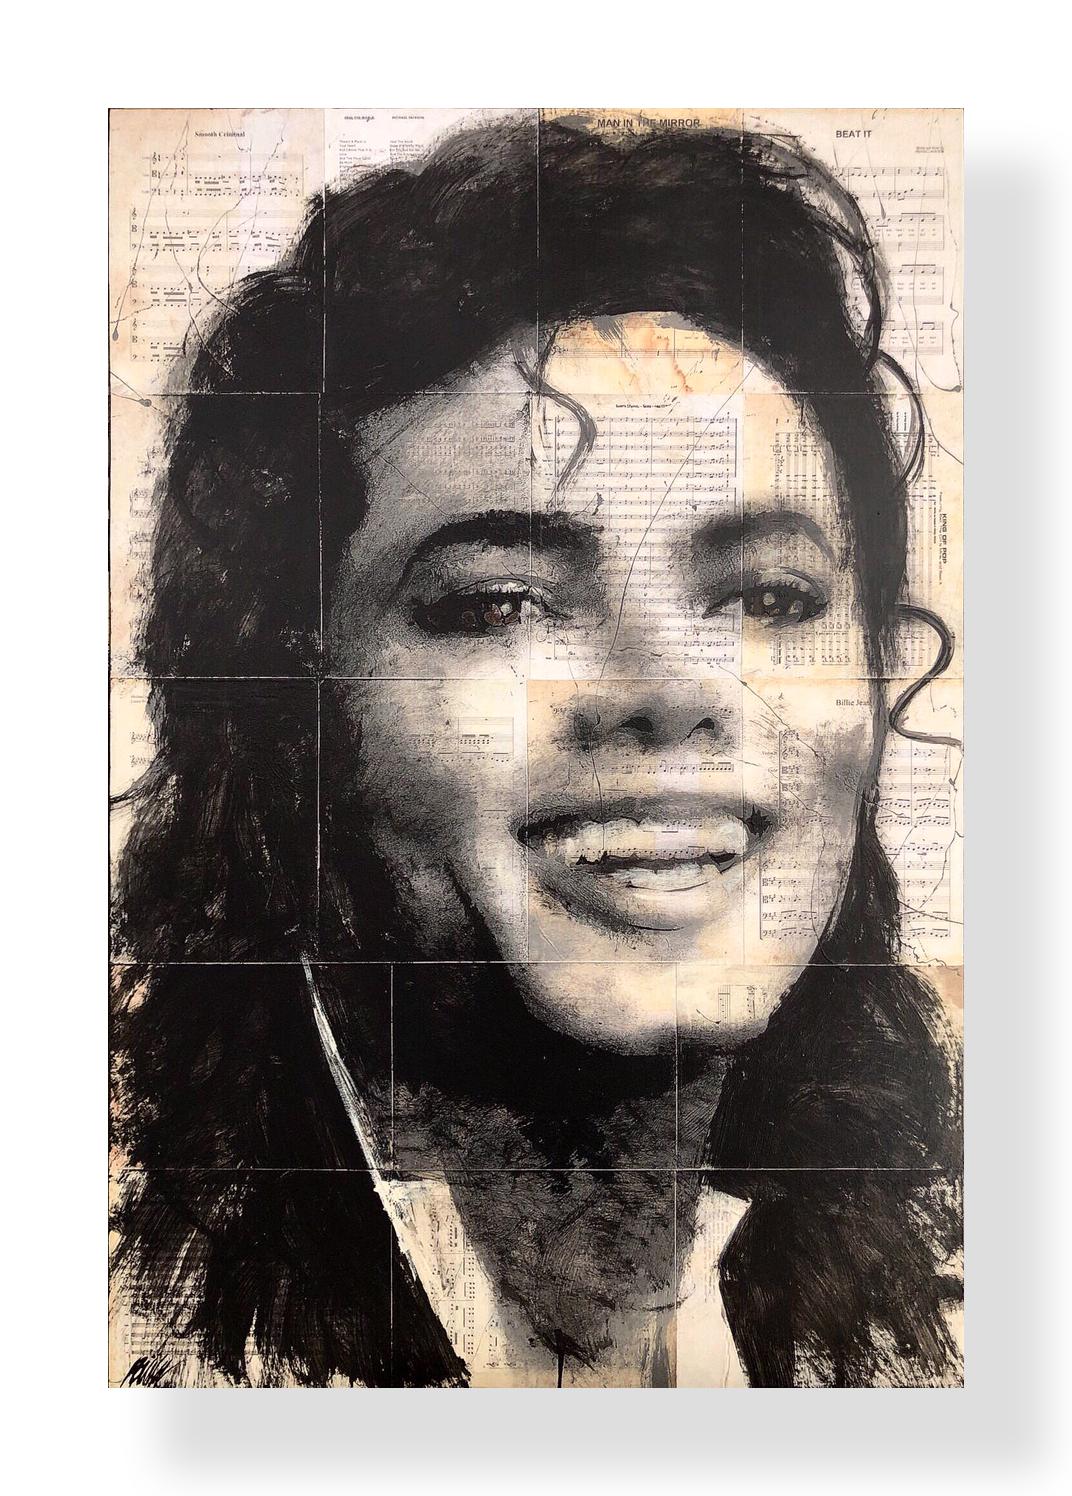 MJ   Acrylic and Latex on Masonite Board  32 x 48 in.